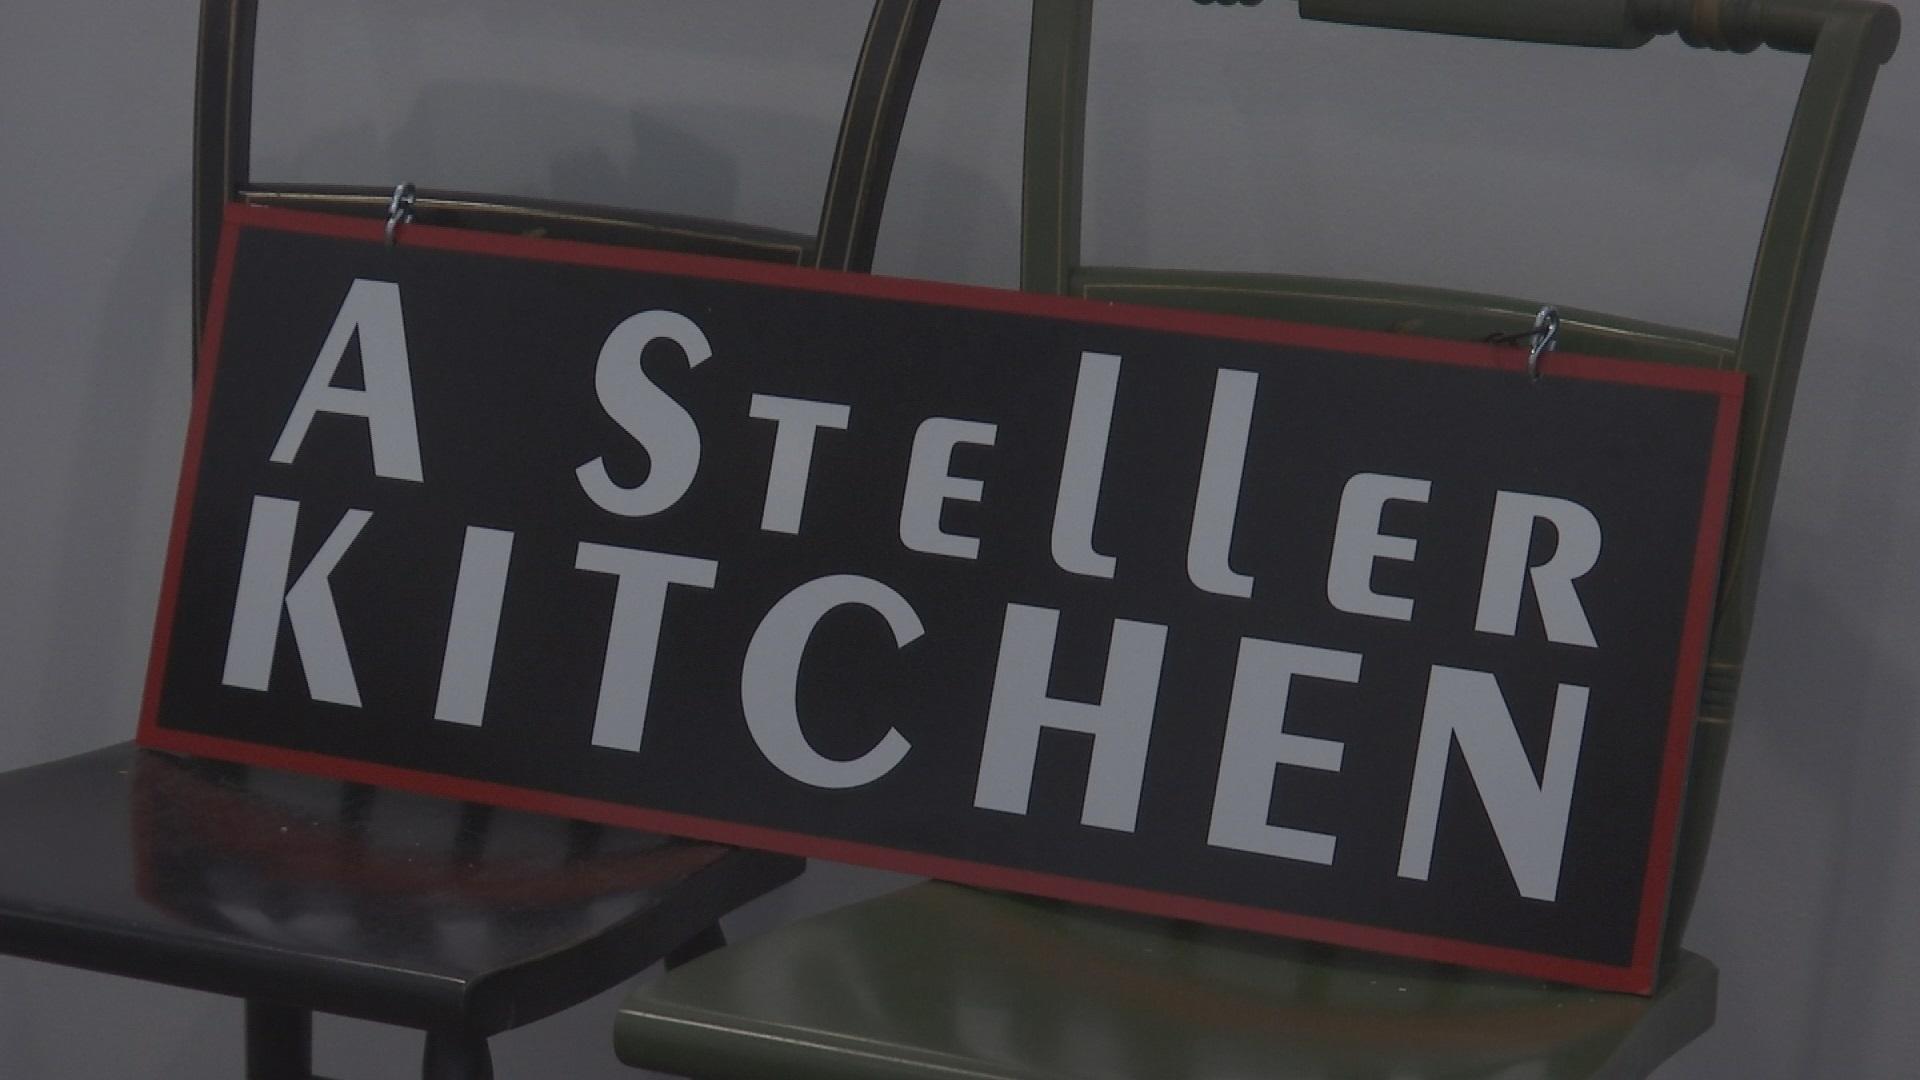 Aiken woman looks to open restaurant to provide keto, other options; needs your help to make happen_1546981220164.jpg.jpg